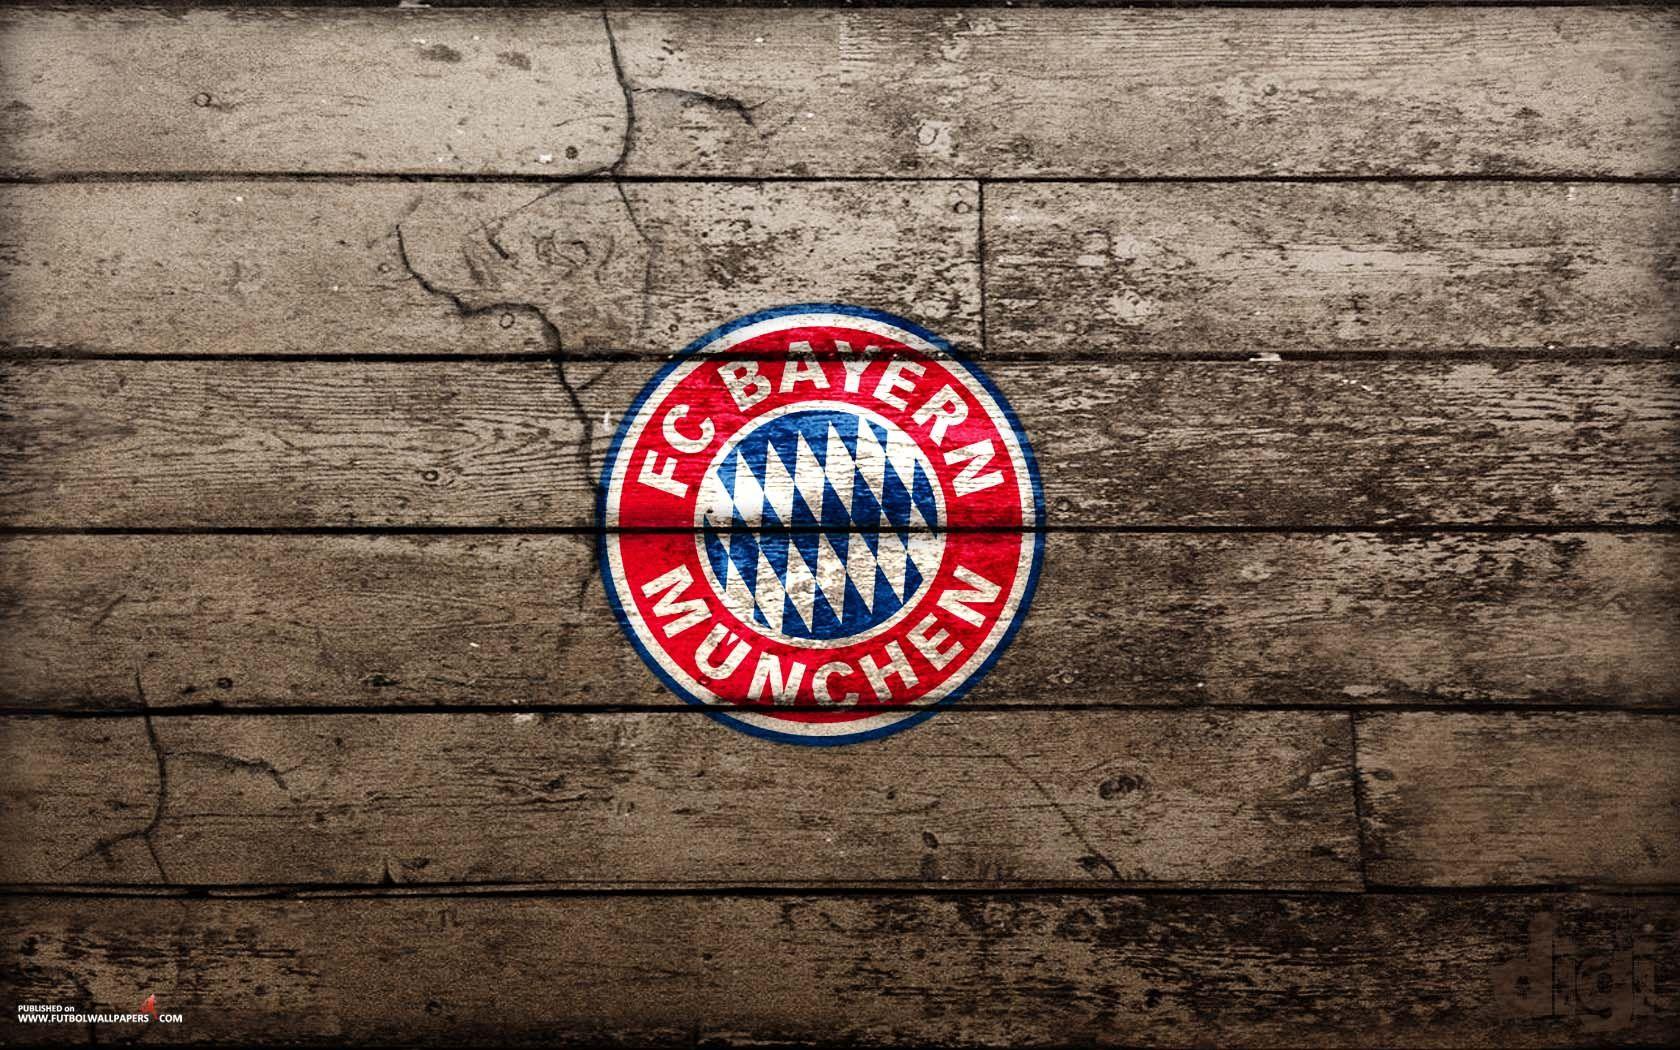 Bayern Munich Google Images Real Madrid Wallpapers Madrid Wallpaper Real Madrid Logo Wallpapers